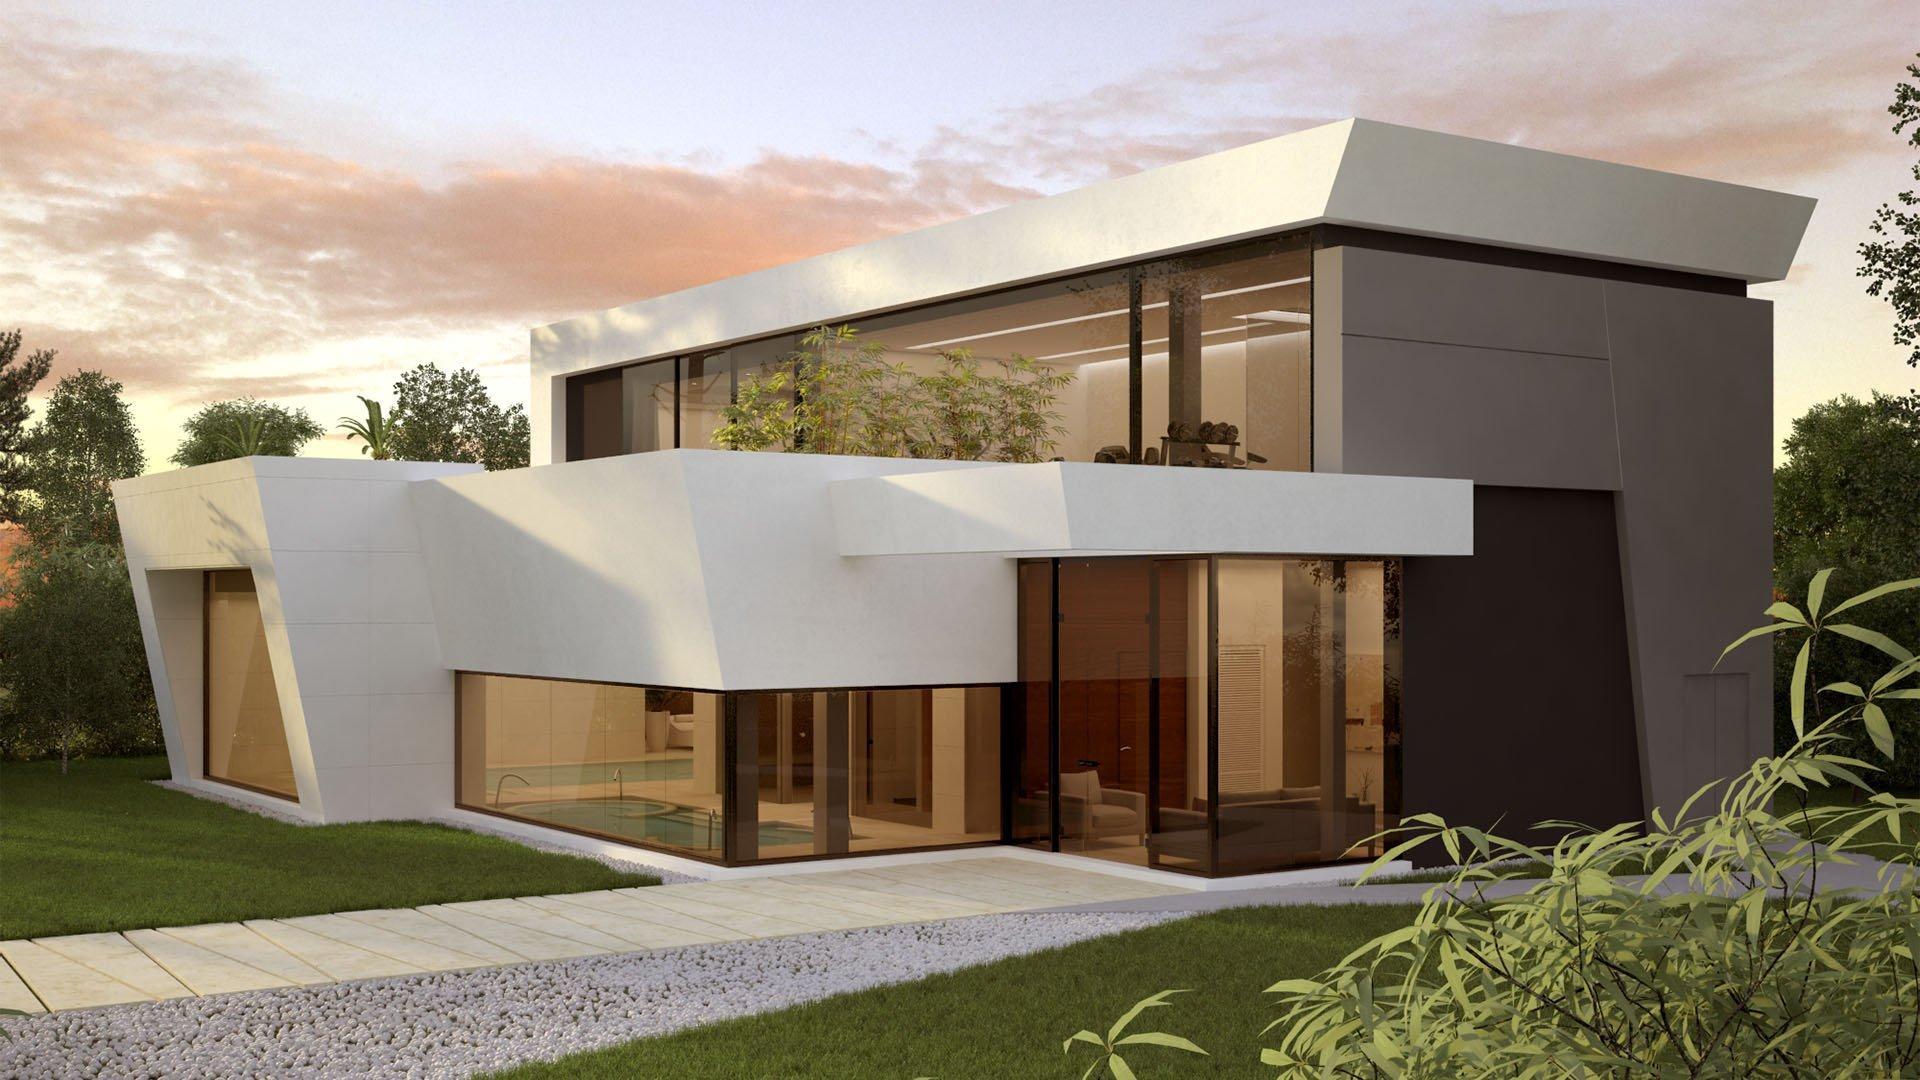 La Finca 2: Amazing residences in a marvelous location in Marbella